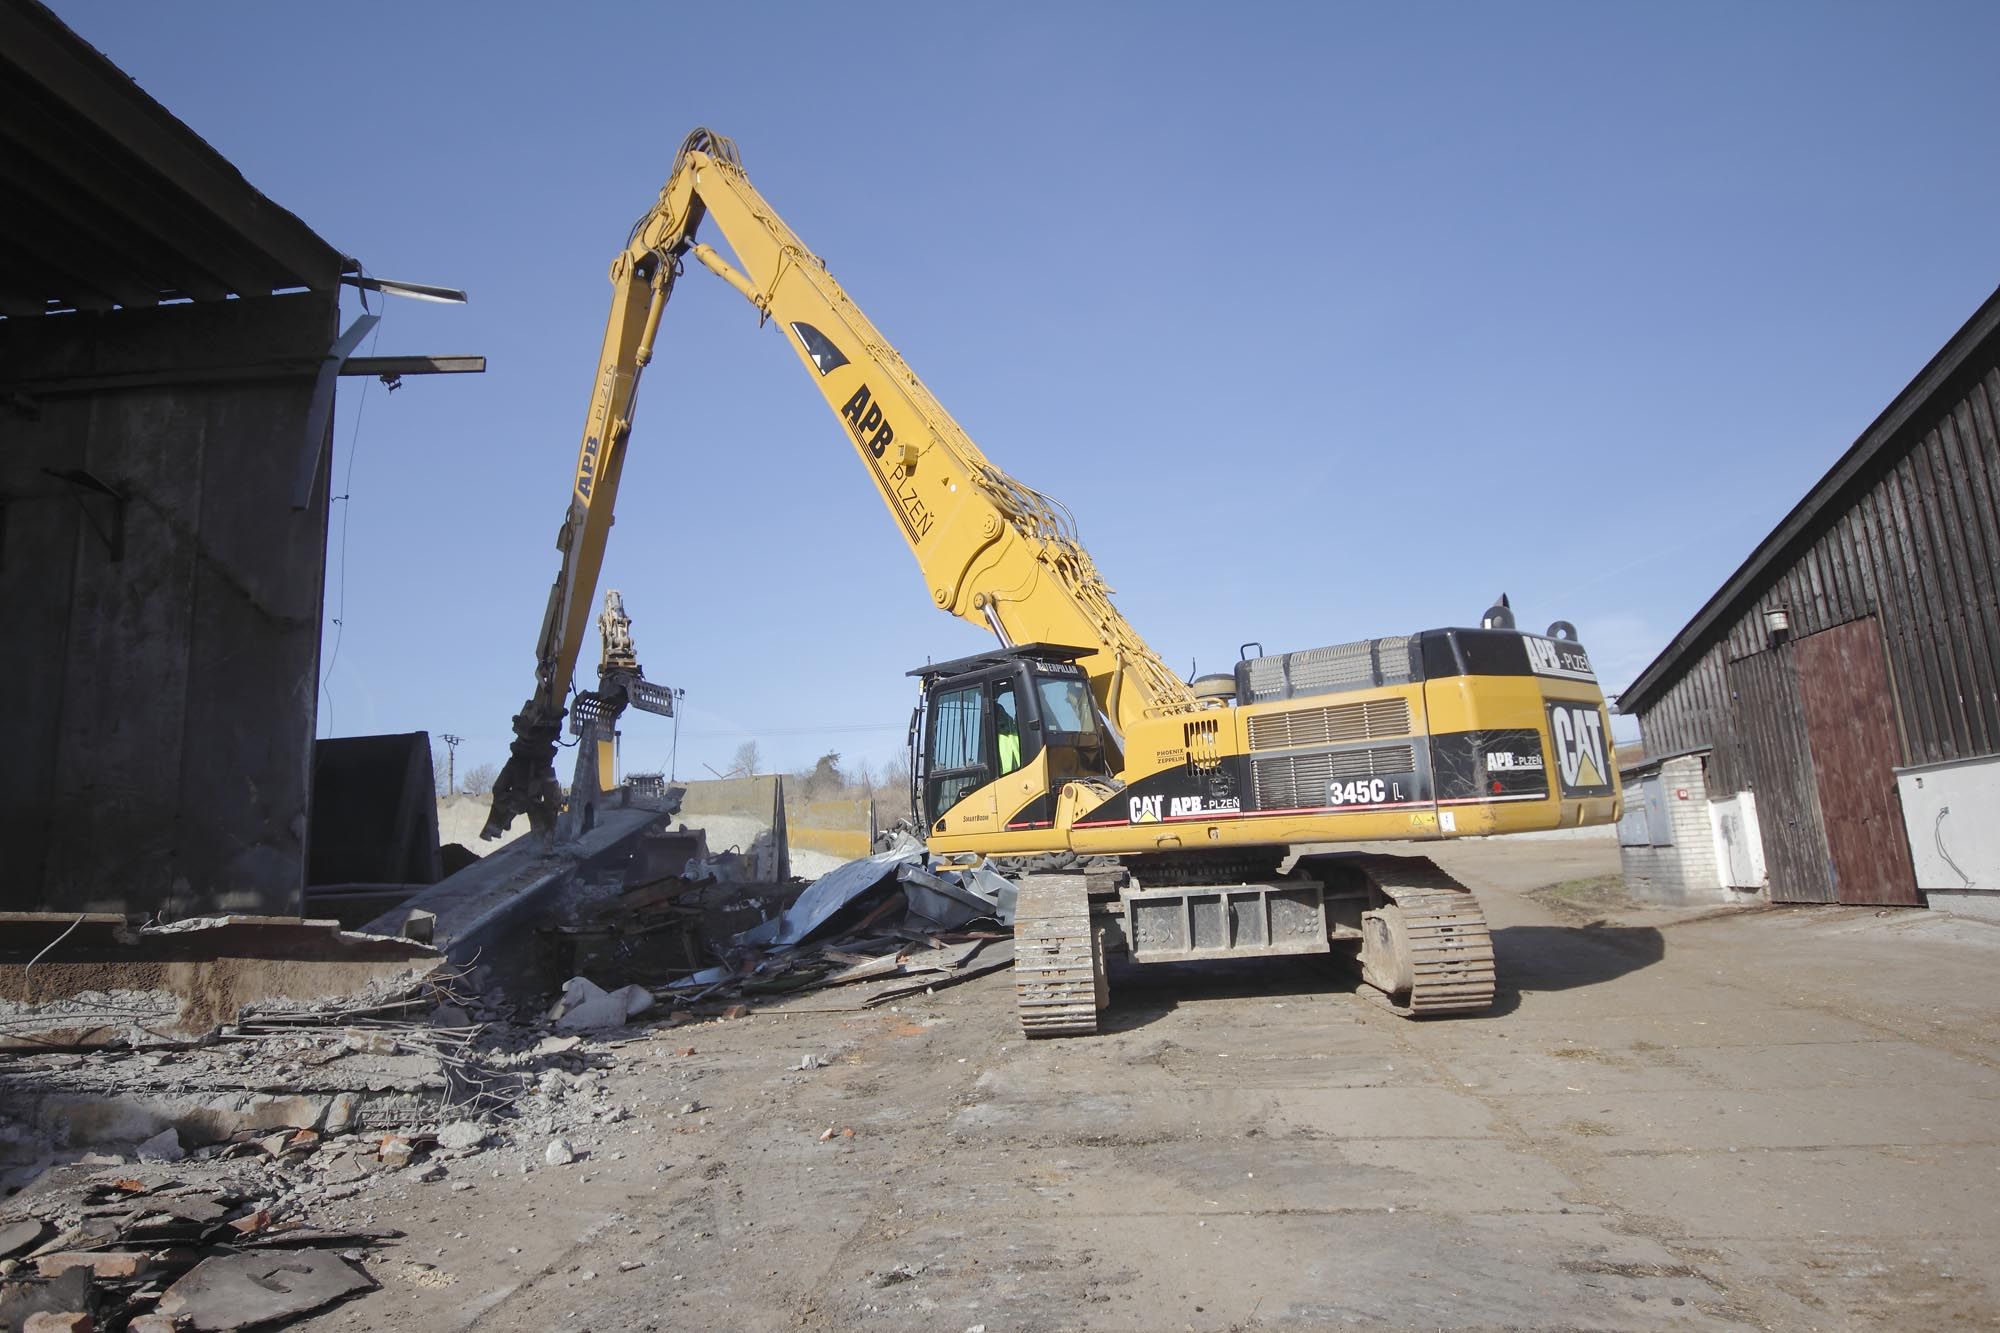 Demolition of reinforced concrete hayloft after a fire »